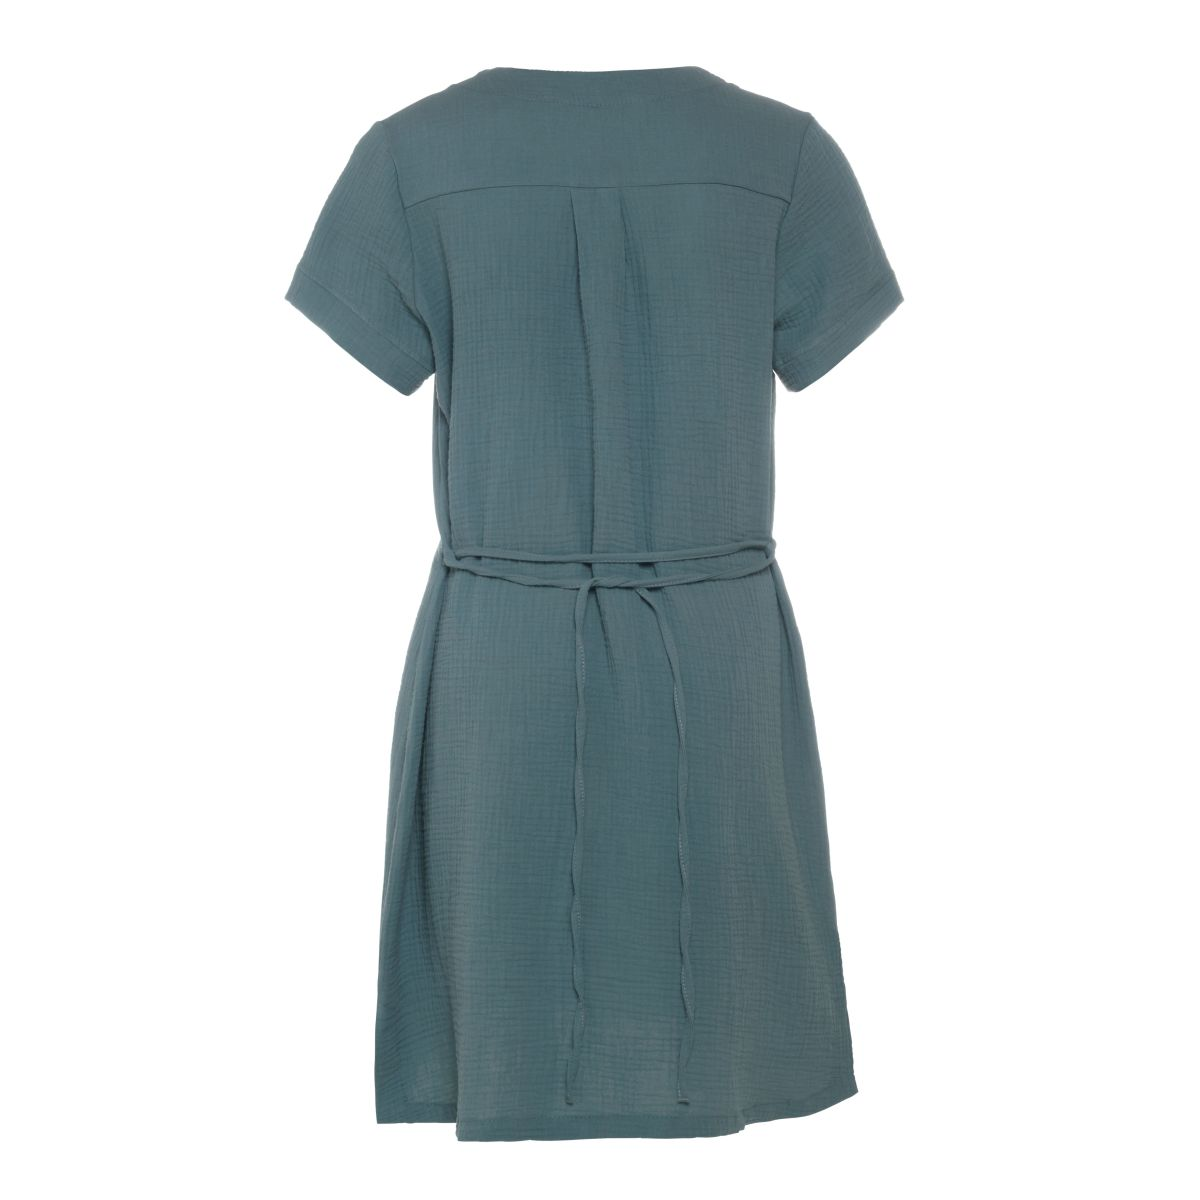 knit factory kf15012000949 indy jurk stone green s 2